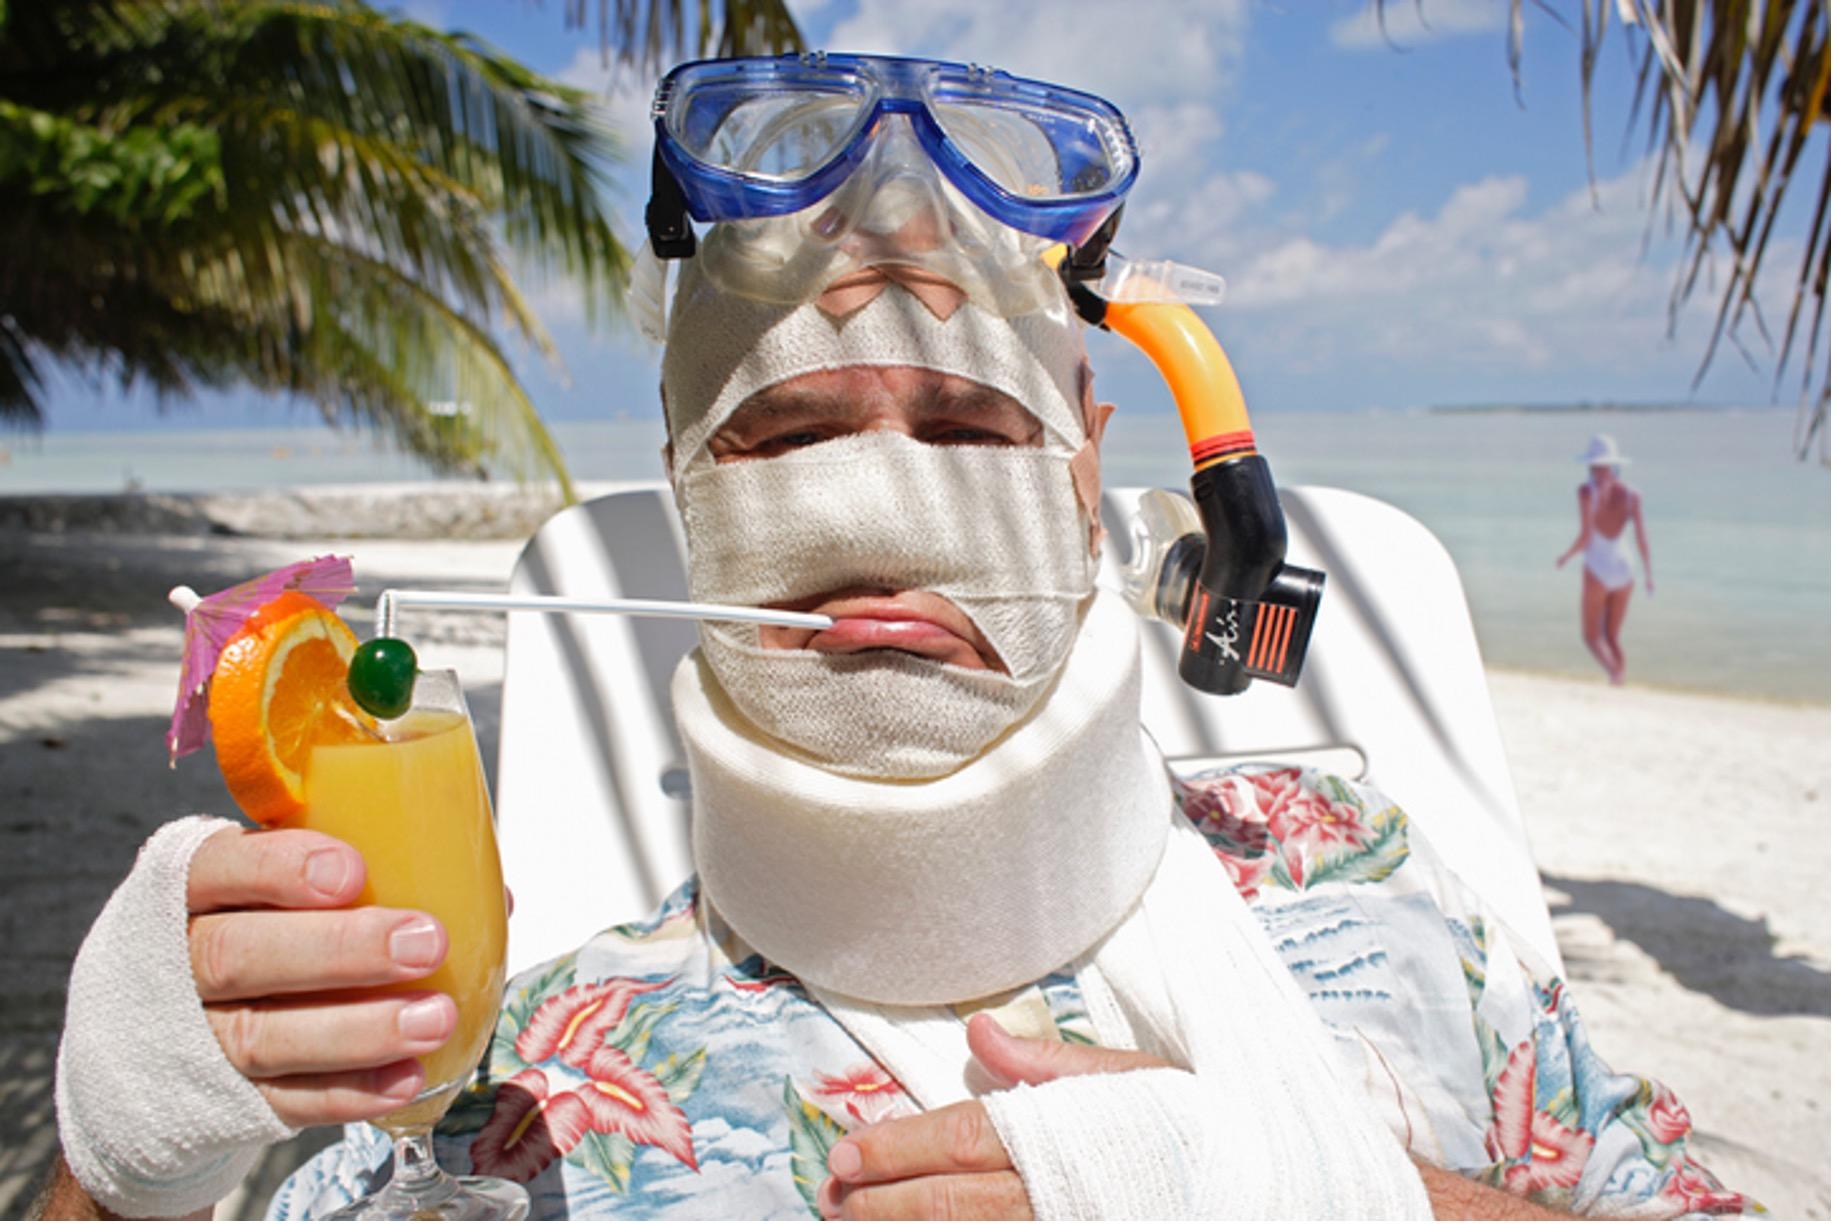 Strandurlaub nach Unfall